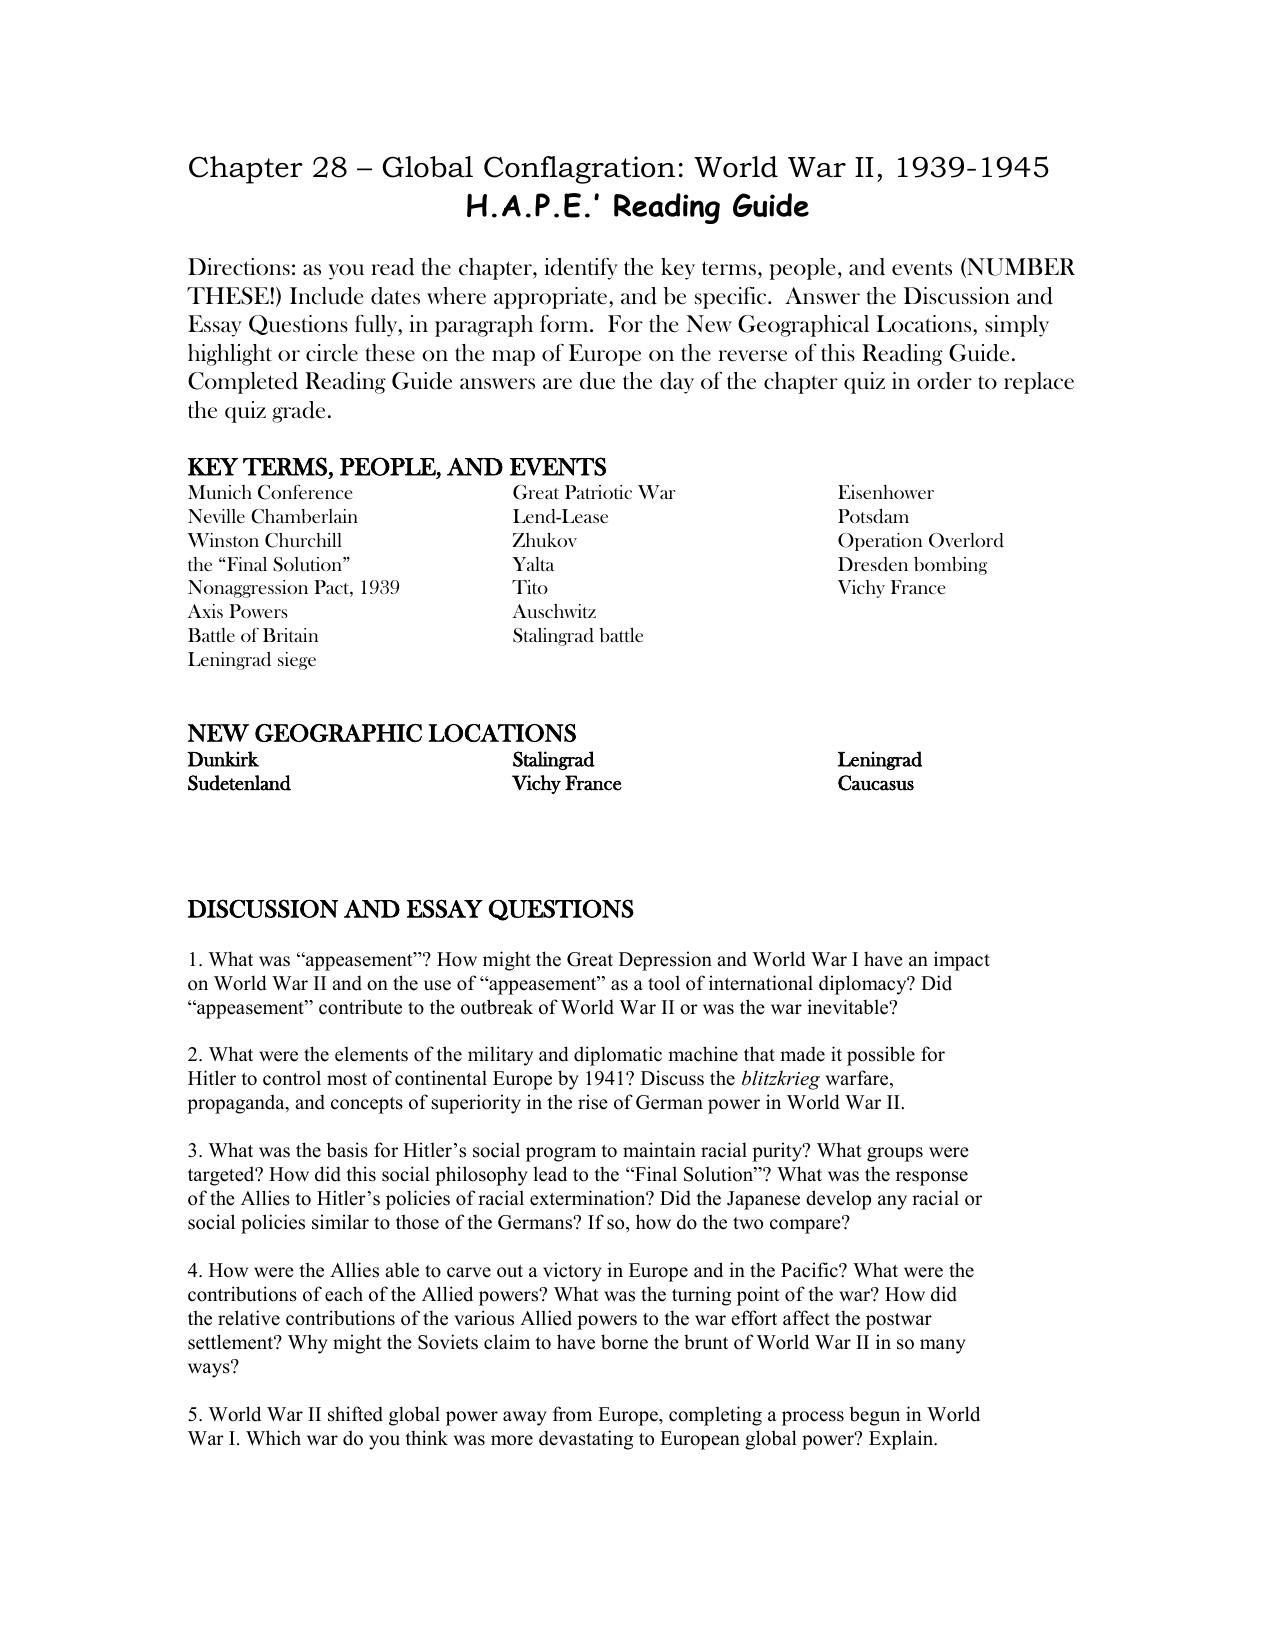 world war 2 essay questions